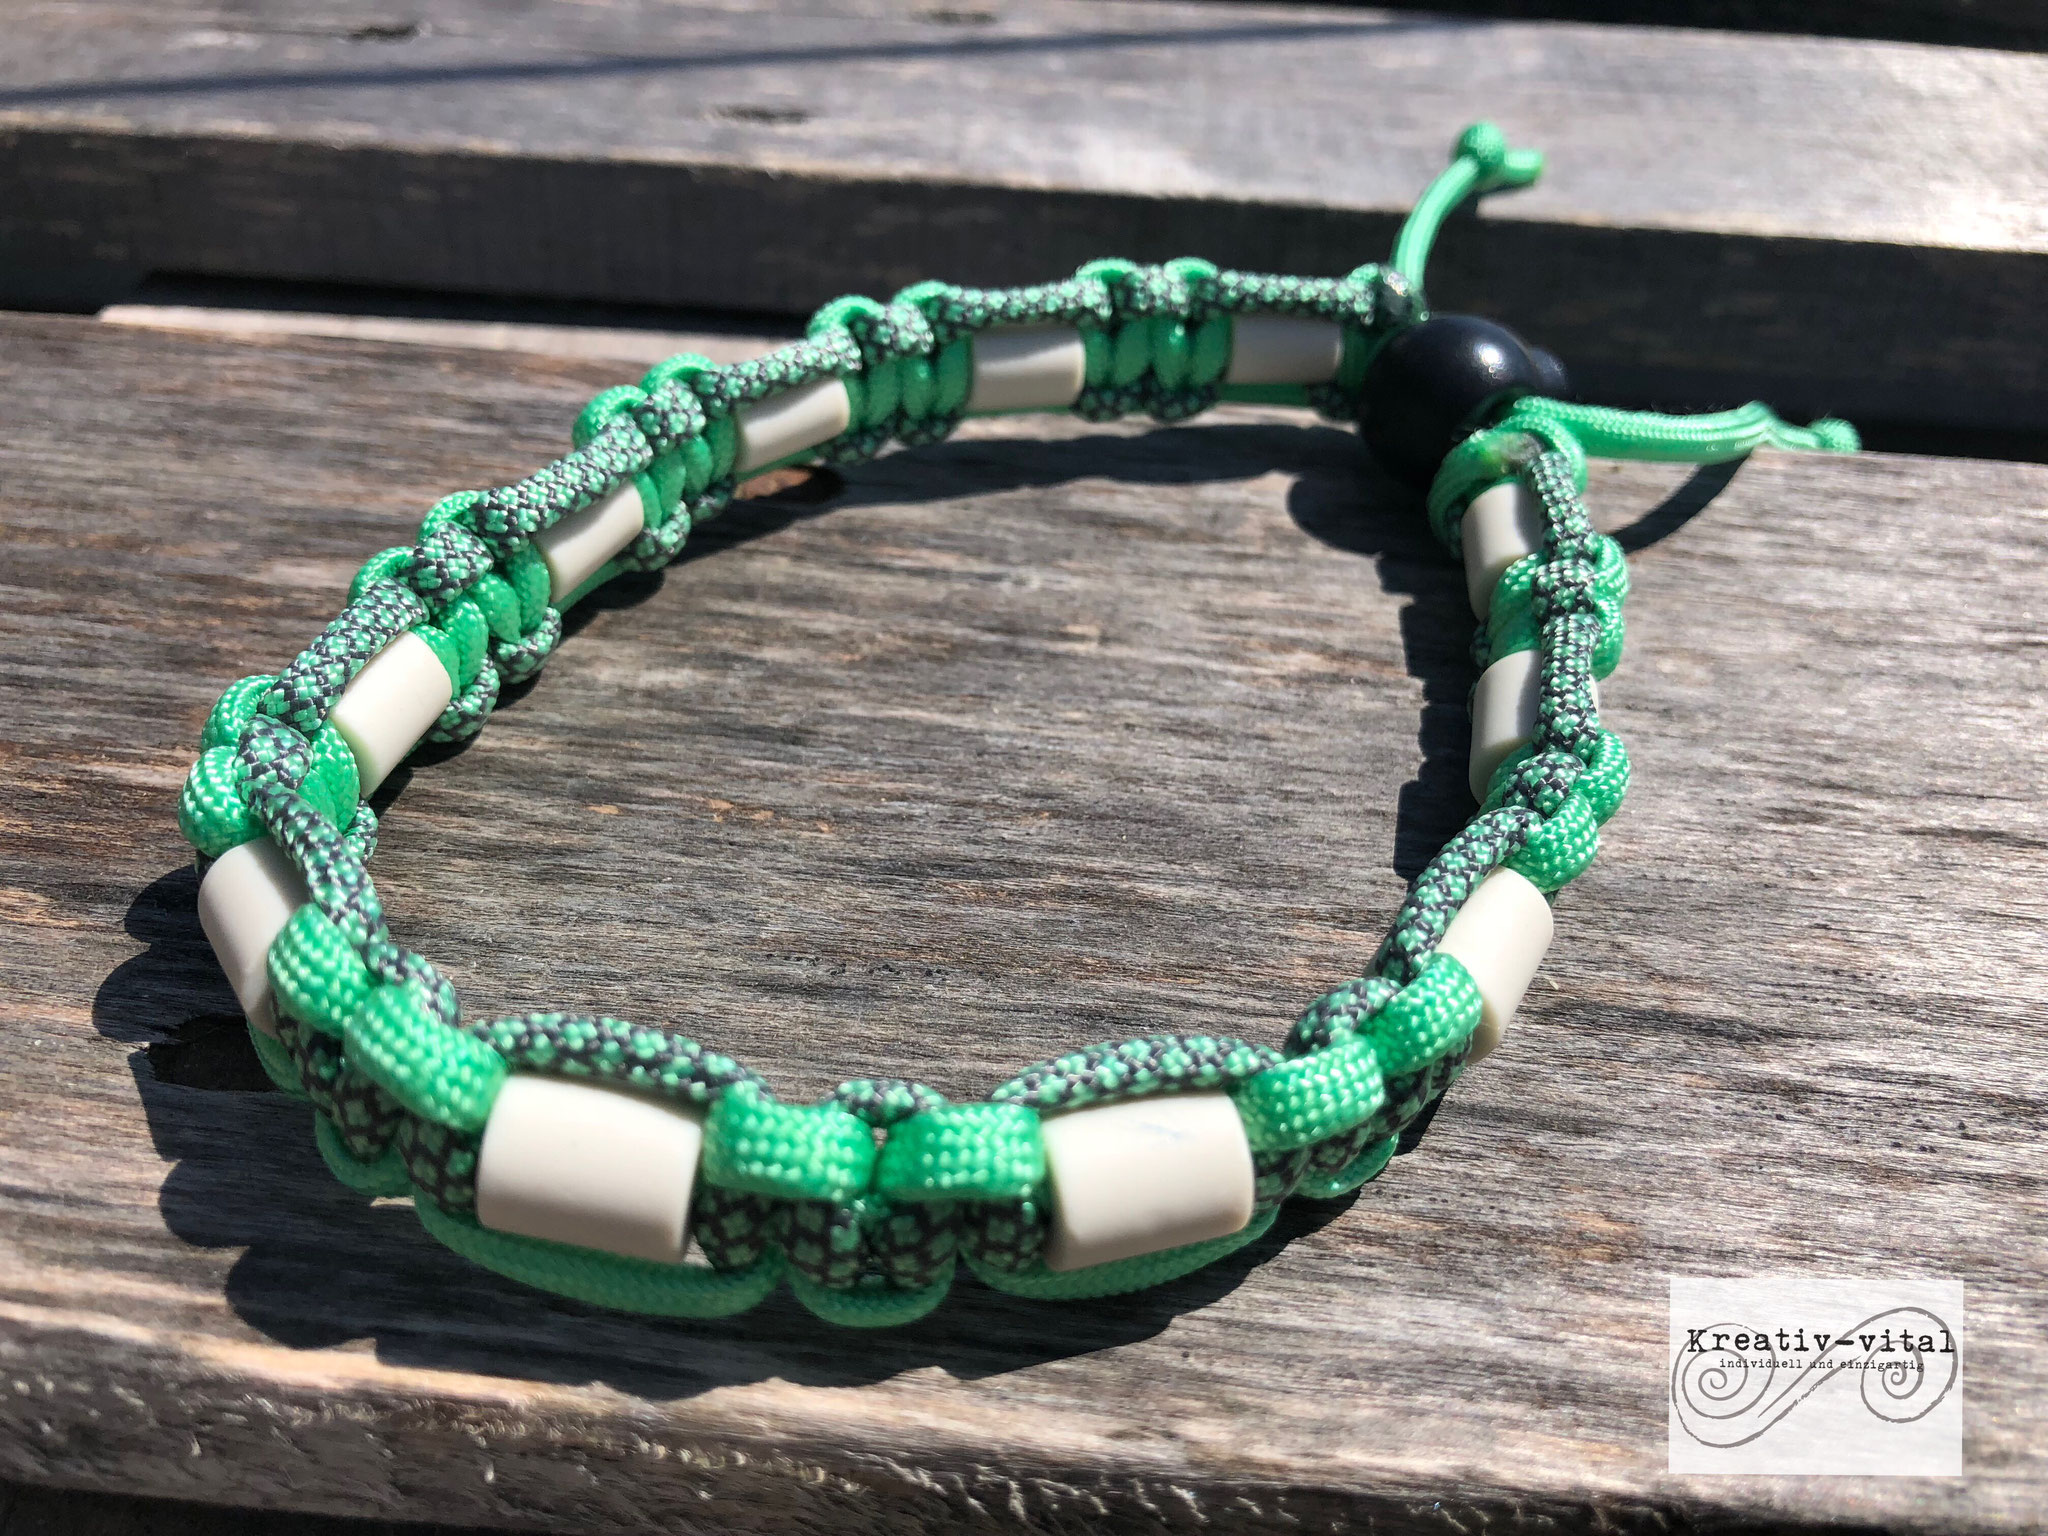 EM Keramik Halsband für Hund/Katze 32-35cm Halsumfang Mint/Charcoal grey mint